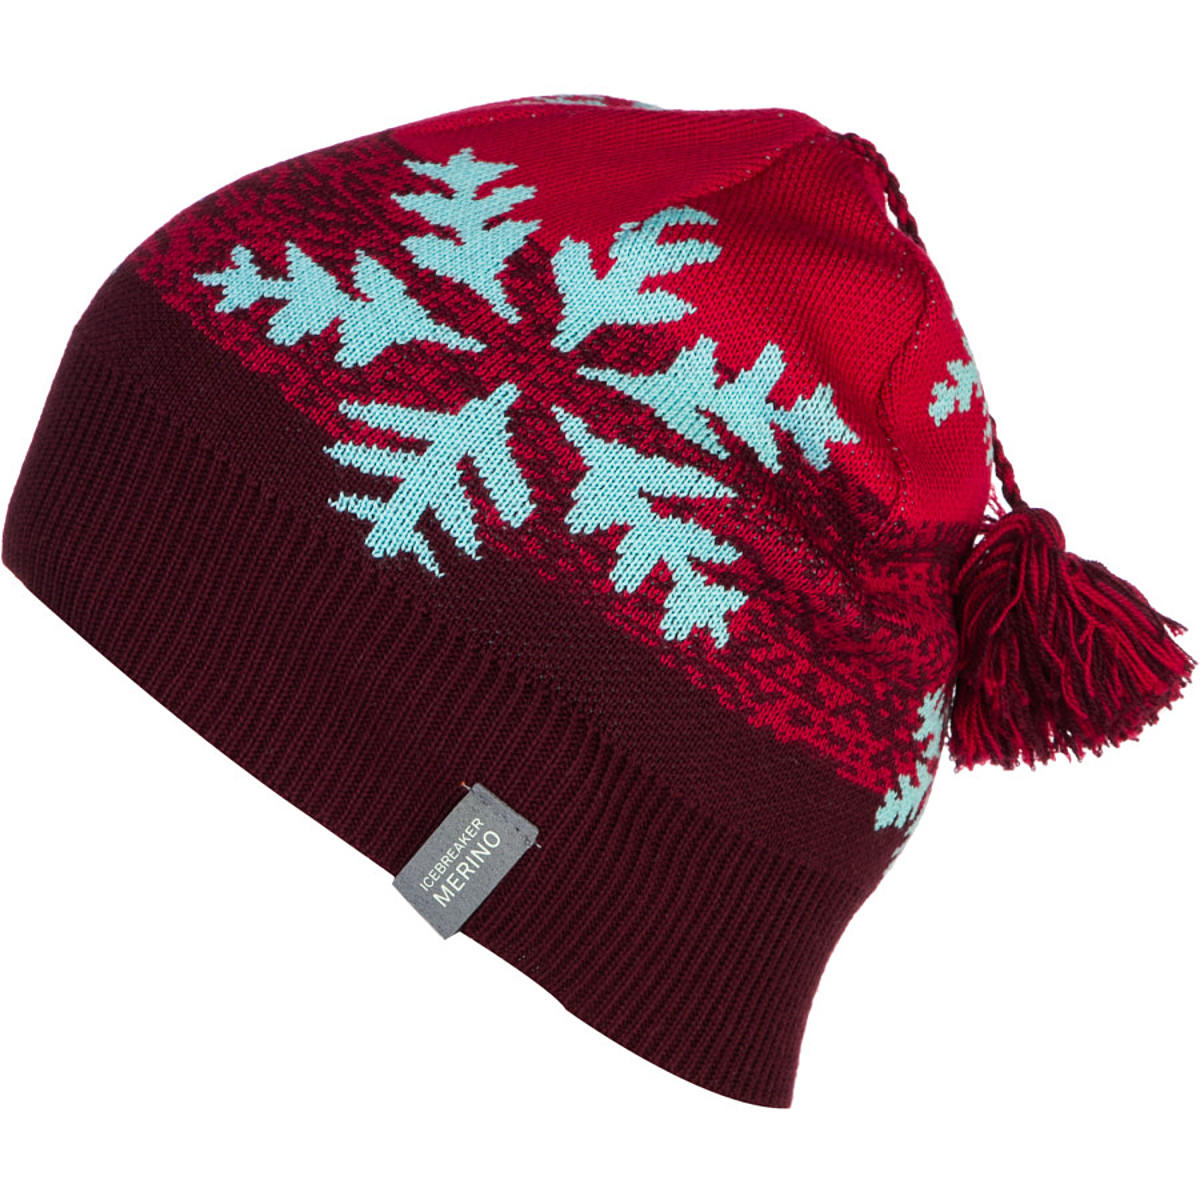 Icebreaker Chalet Hat